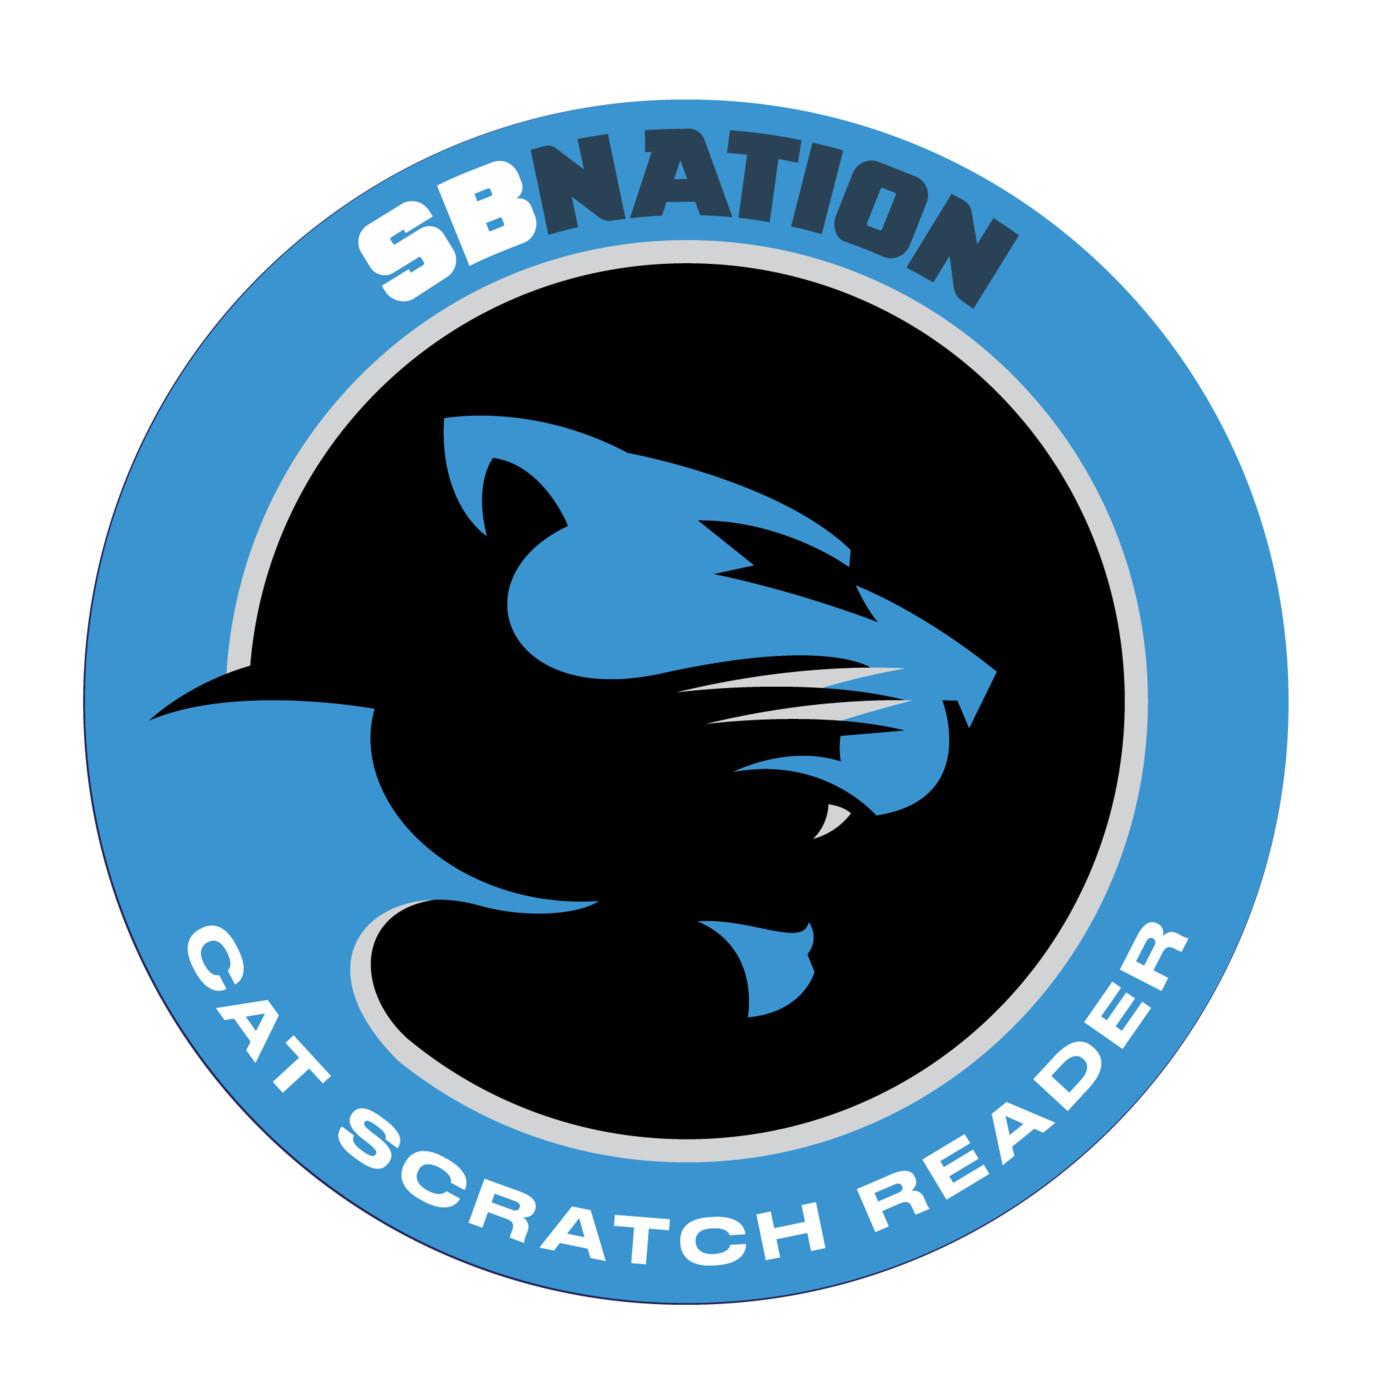 Cat Scratch Reader: for Carolina Panthers fans